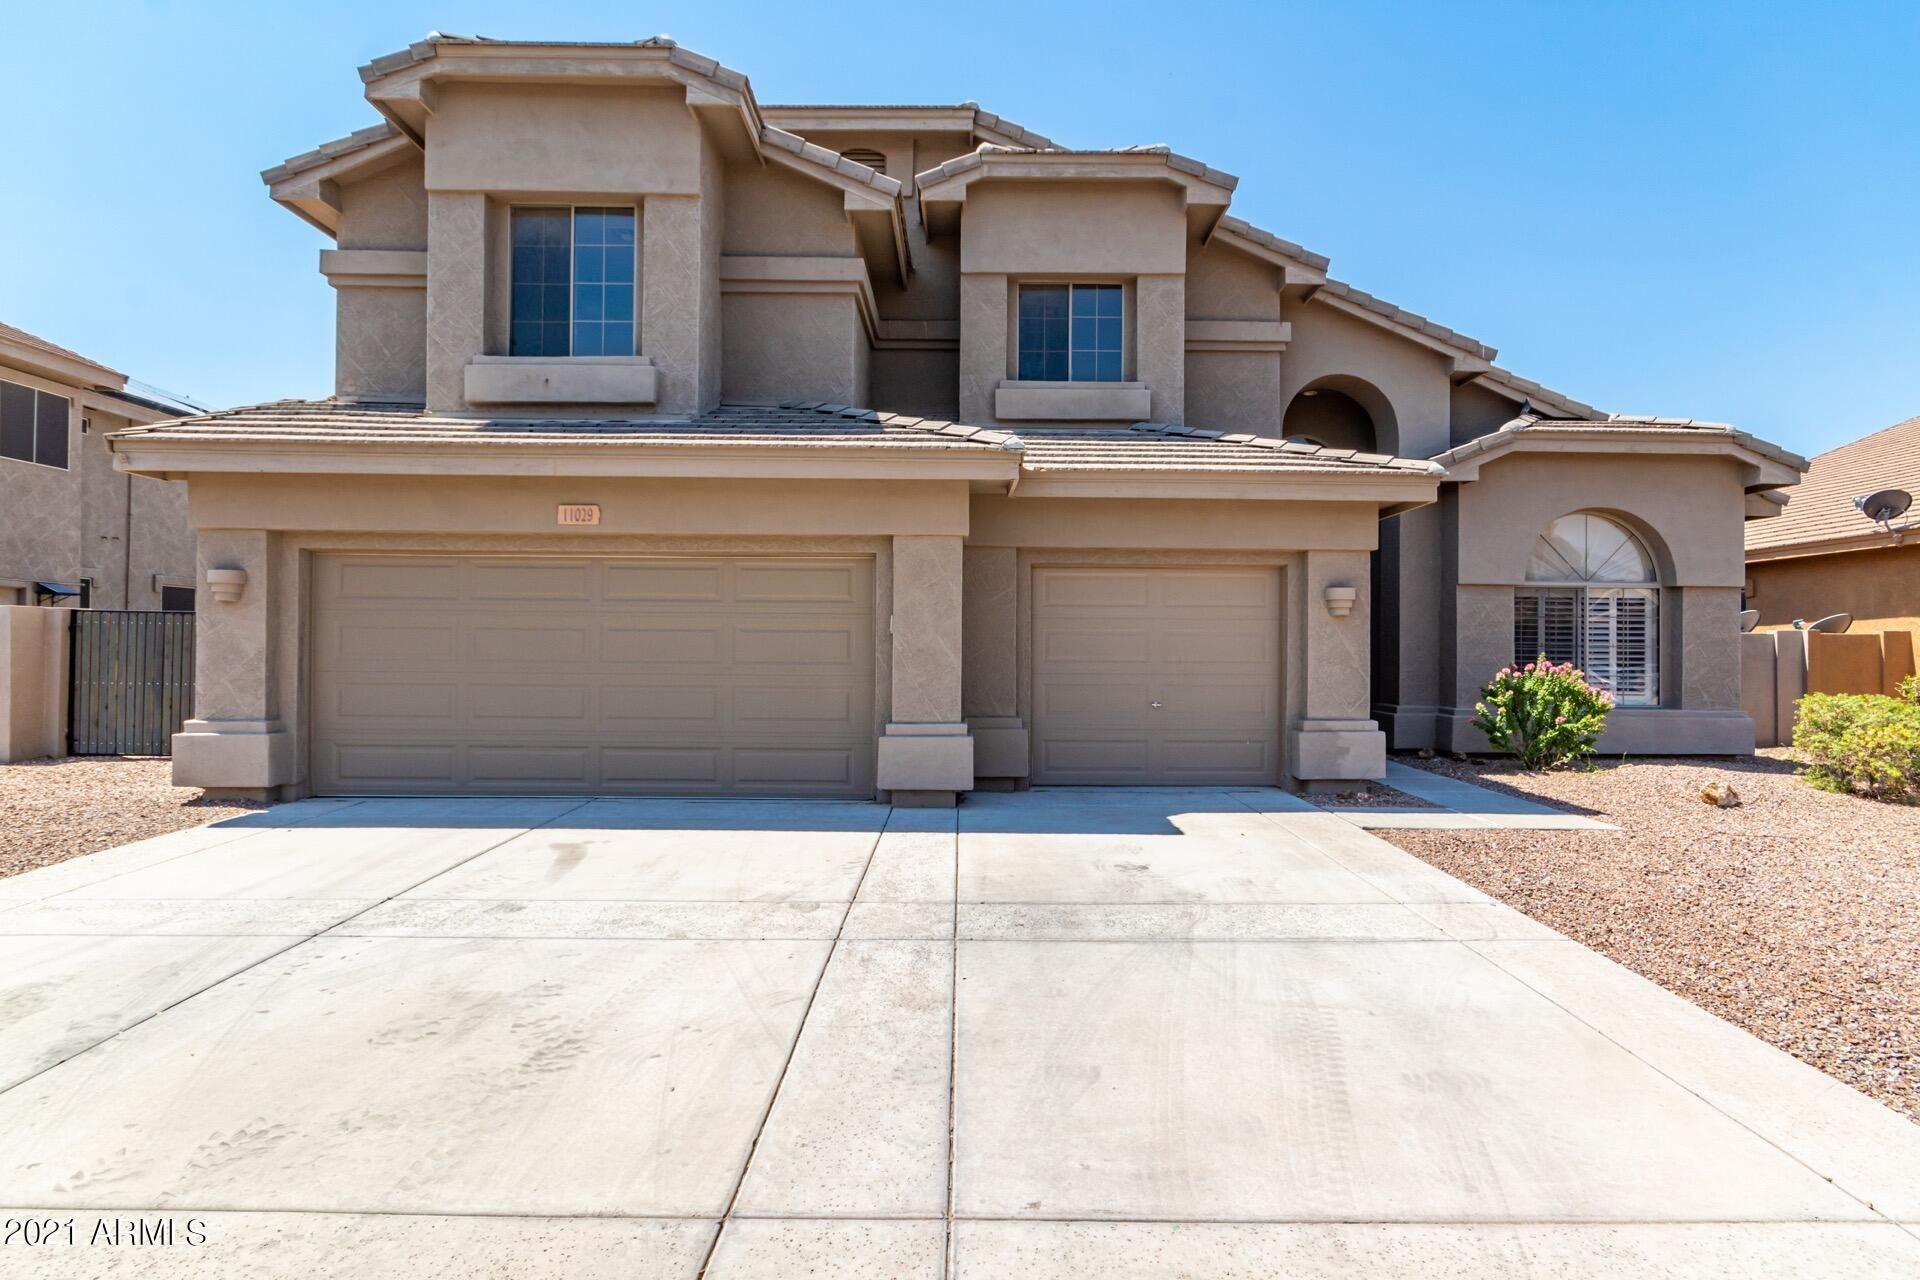 11029 E DECATUR Street, Mesa, AZ 85207 - MLS#: 6228607